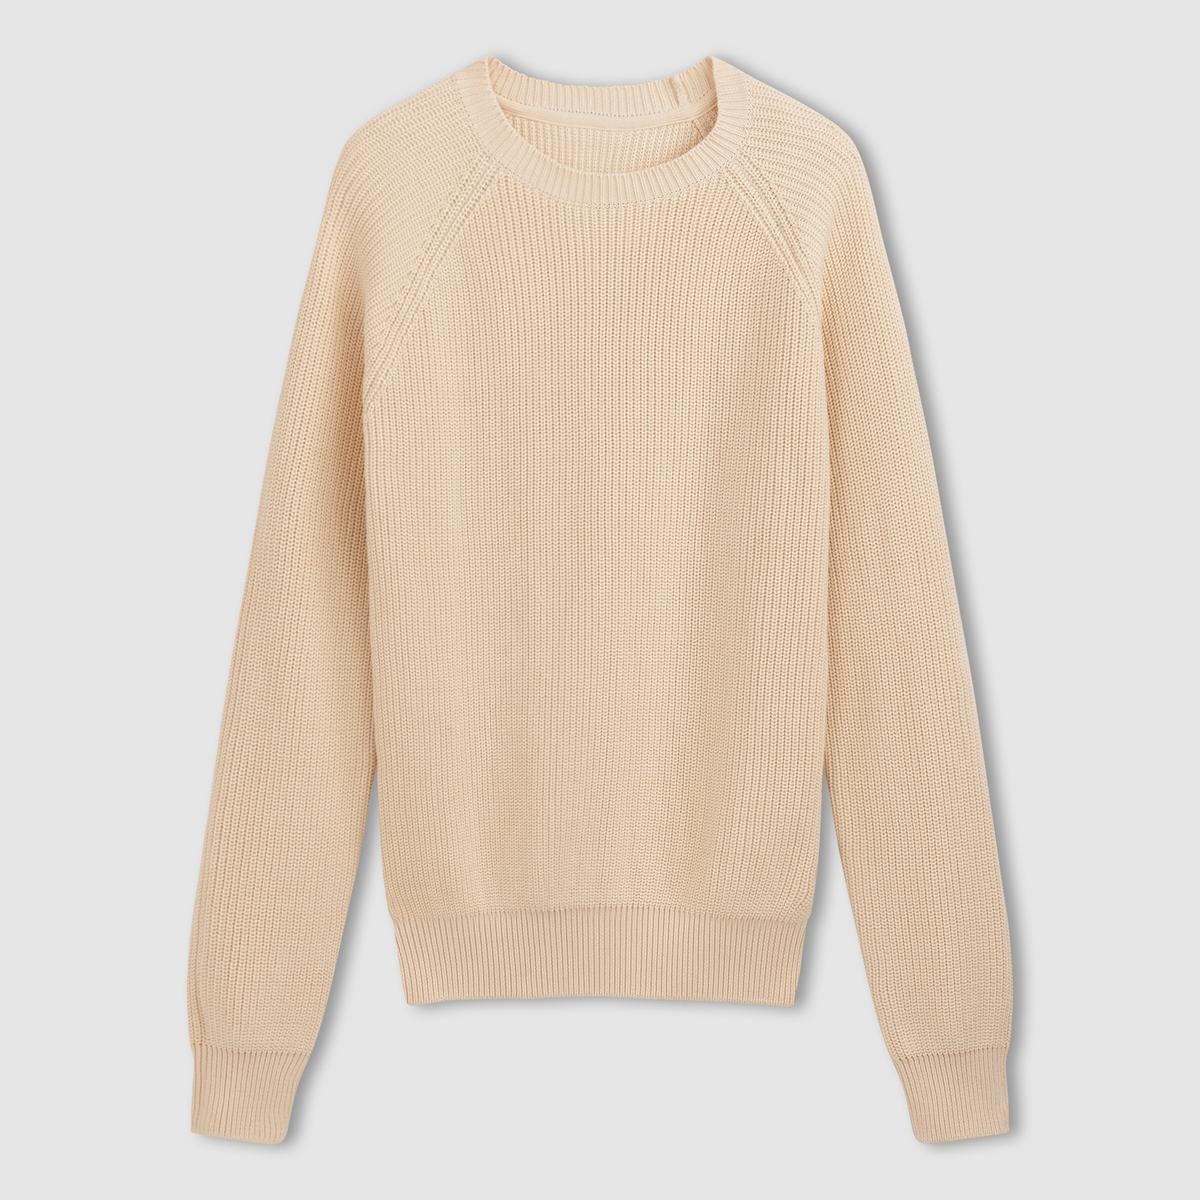 Пуловер из фантазийного трикотажа, 100% хлопка от La Redoute Collections